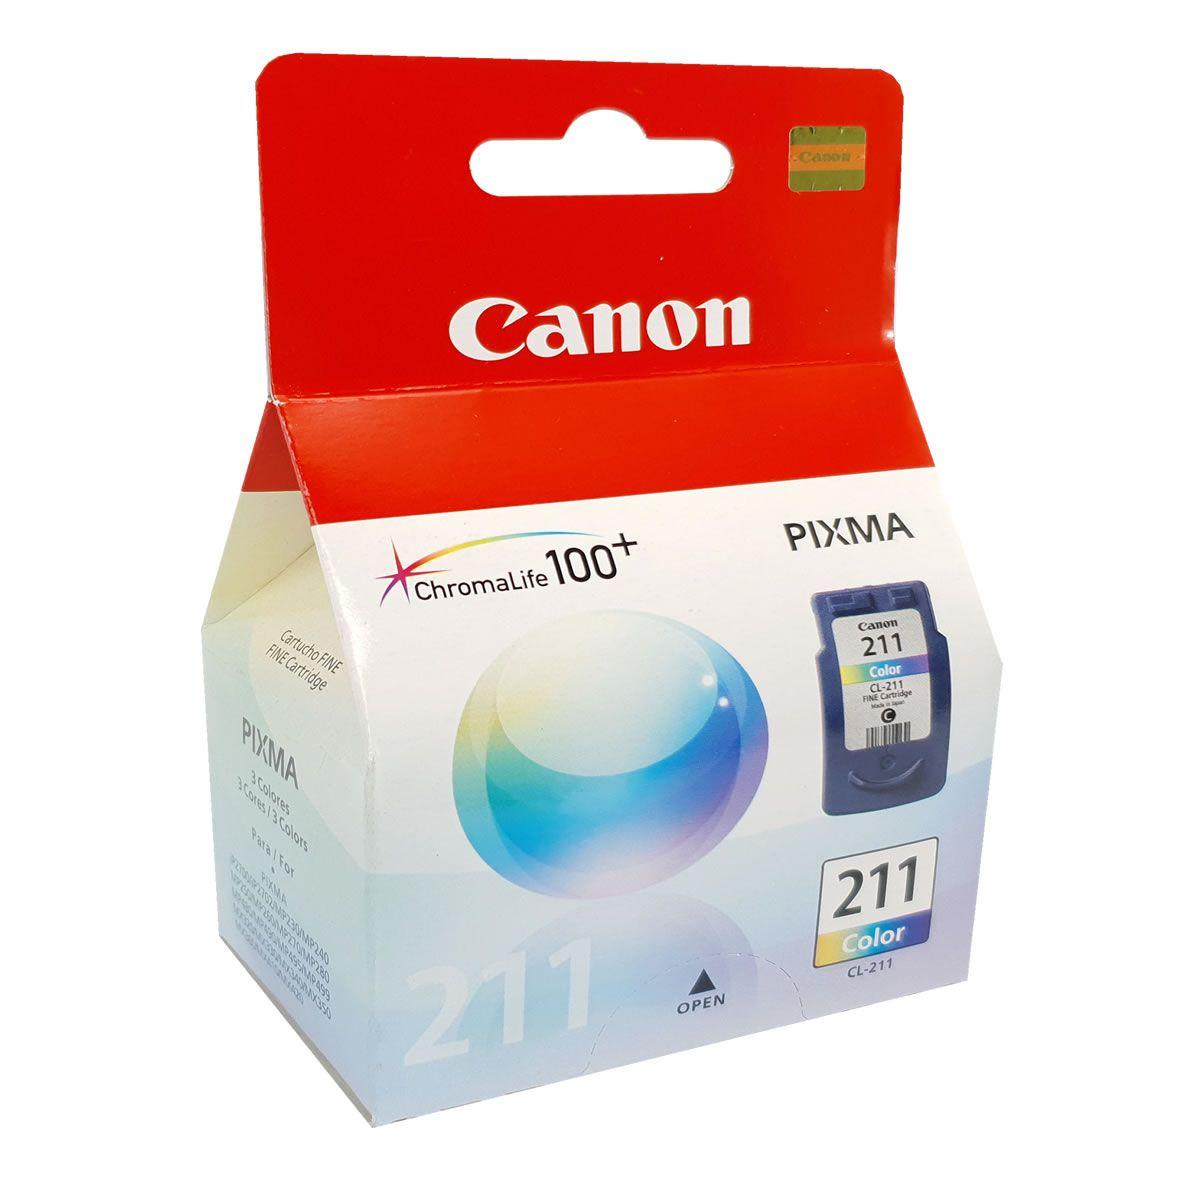 Cartucho Canon CL211 Colorido para MP240 MP250 MP260 MP490 MP480 MX330